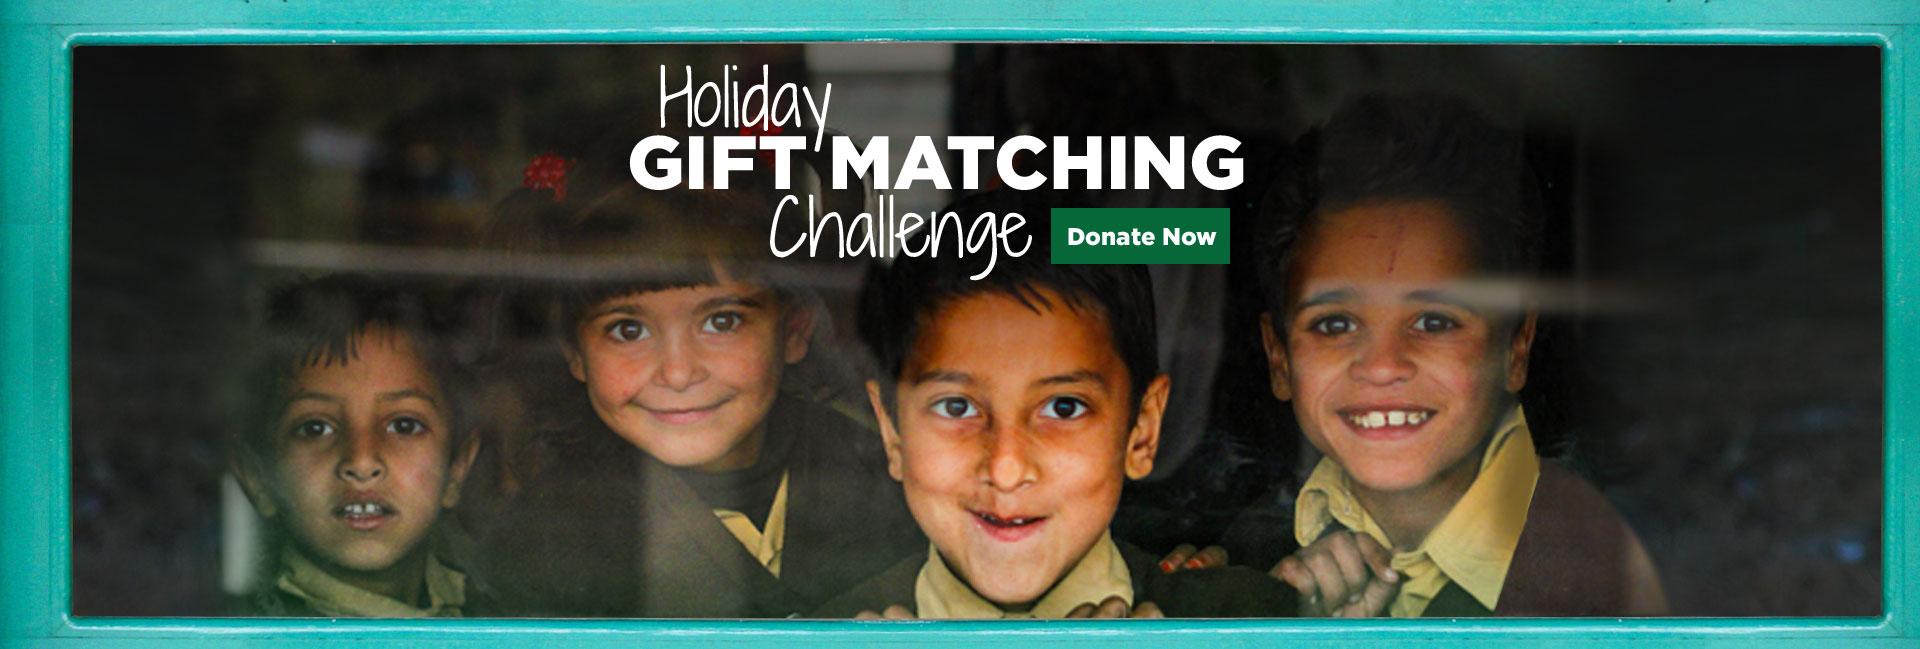 holiday-gift-matchingchallenge_homepage-banner